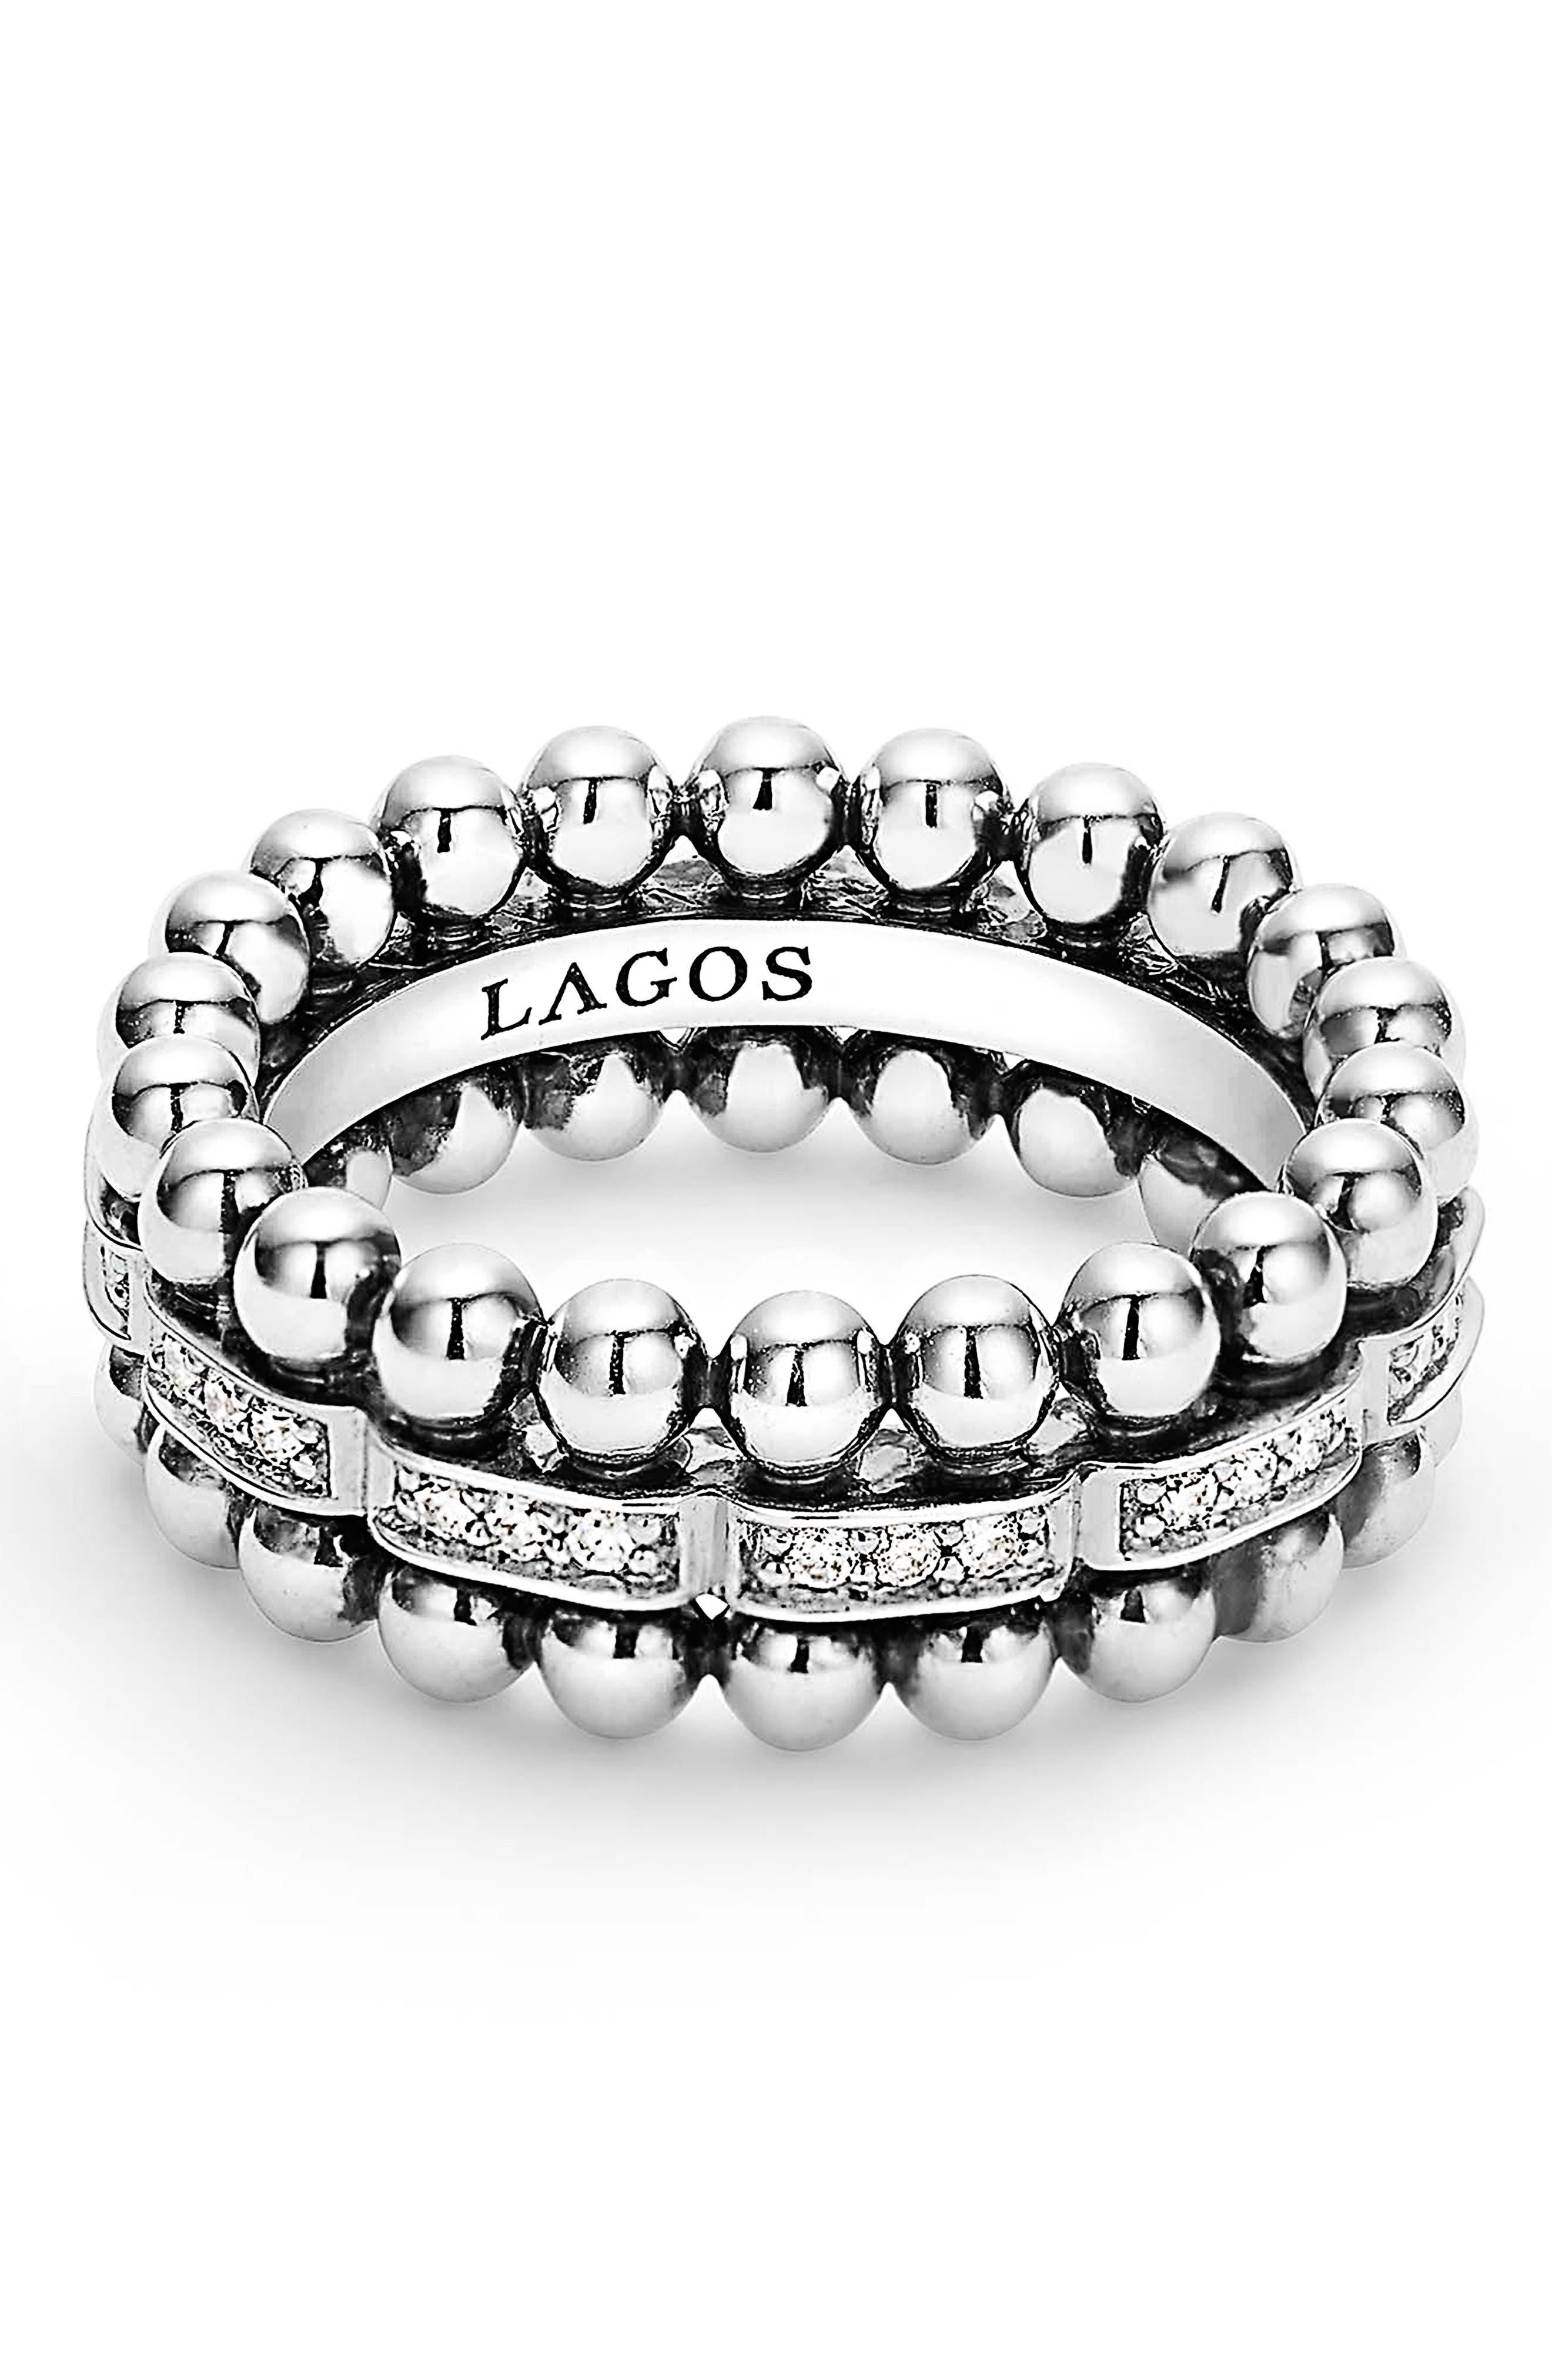 Caviar Spark Diamond Band Ring,                             Alternate thumbnail 3, color,                             SILVER/ DIAMOND